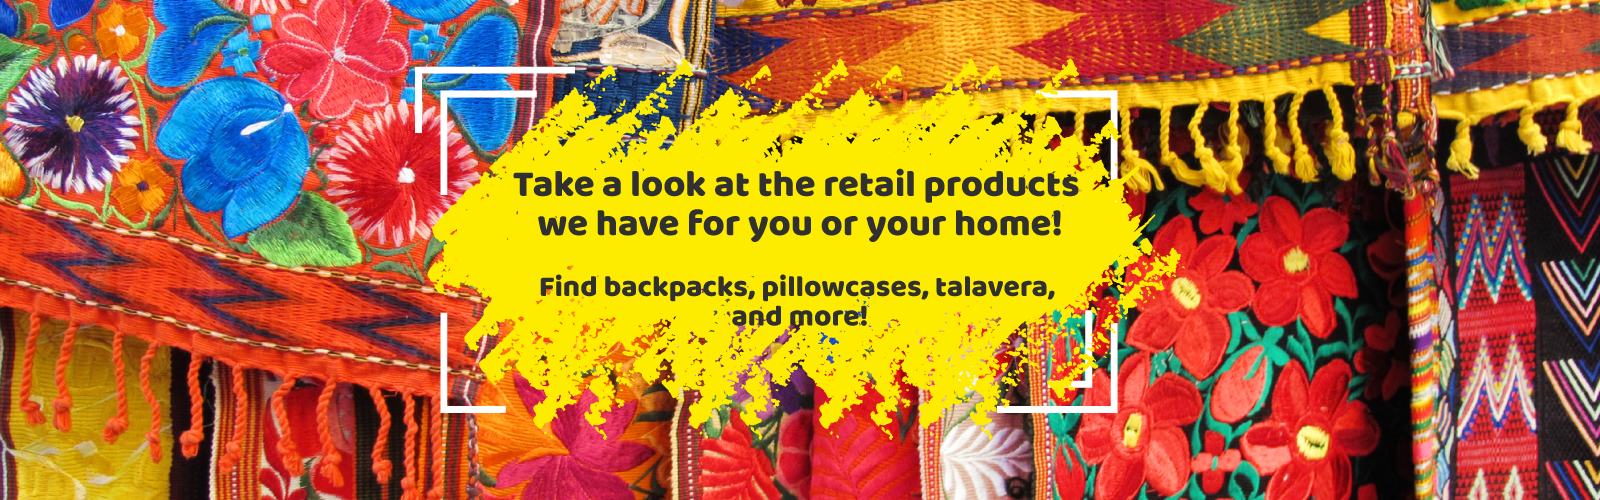 Retail Productos